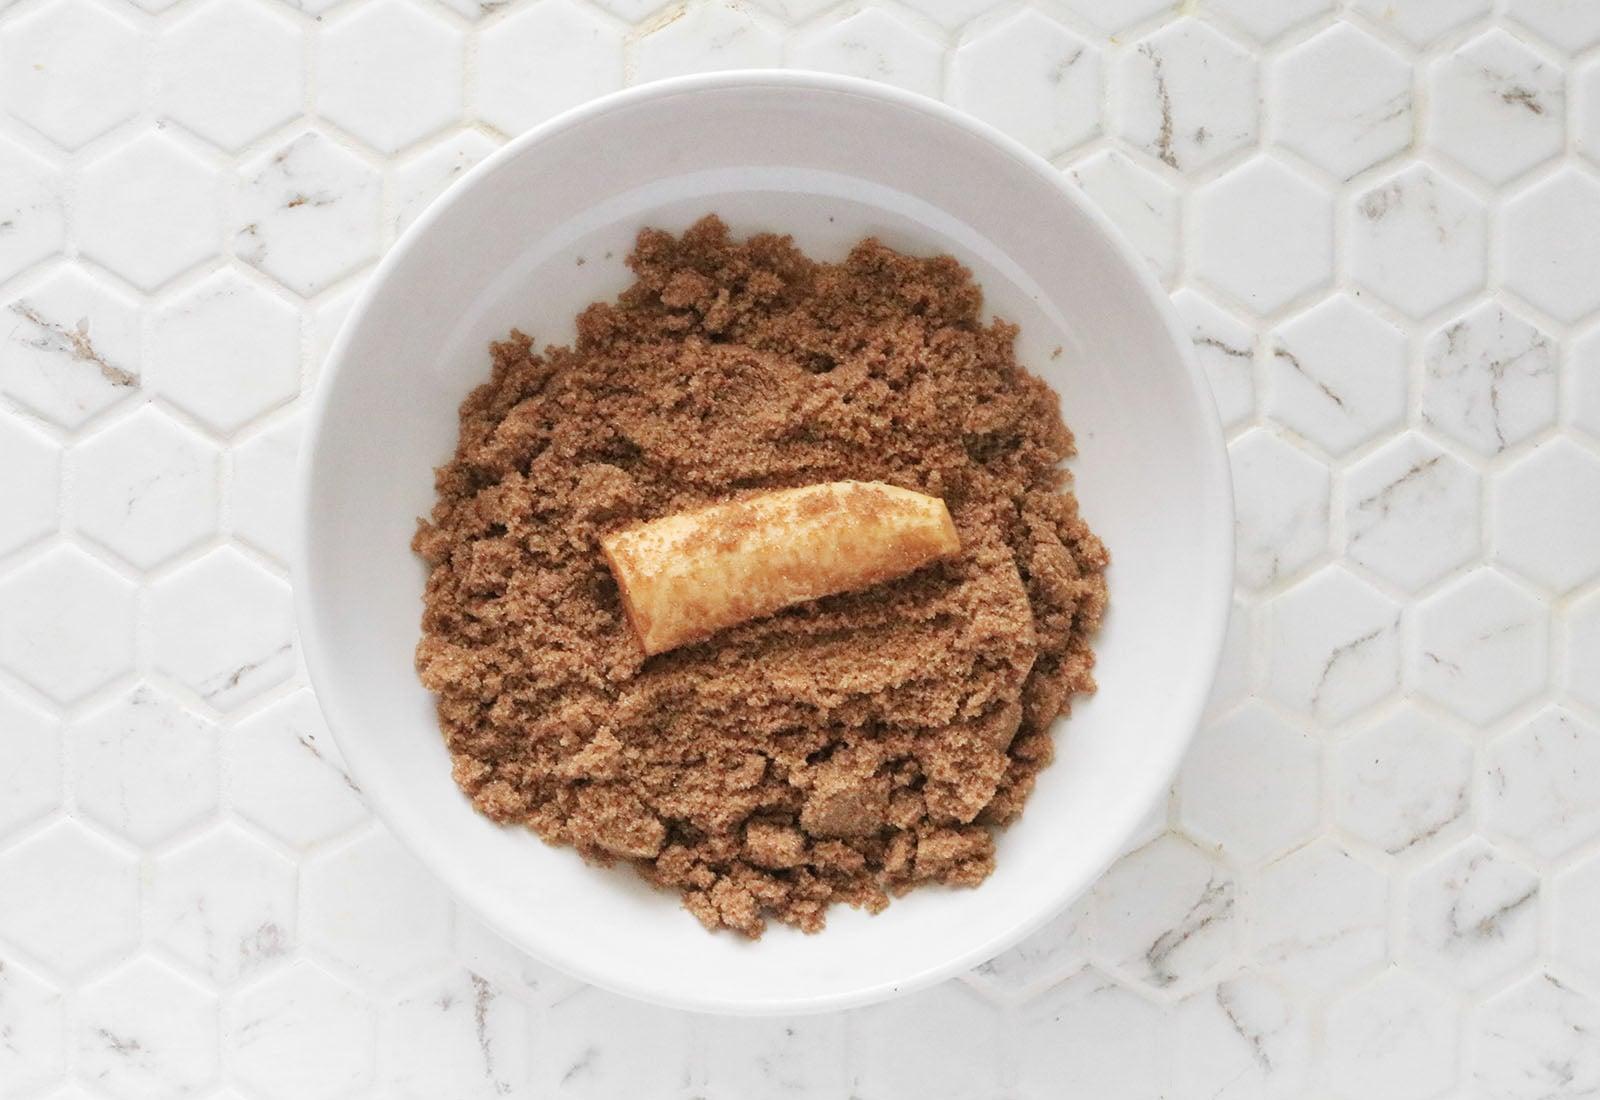 Roll plantain in brown sugar